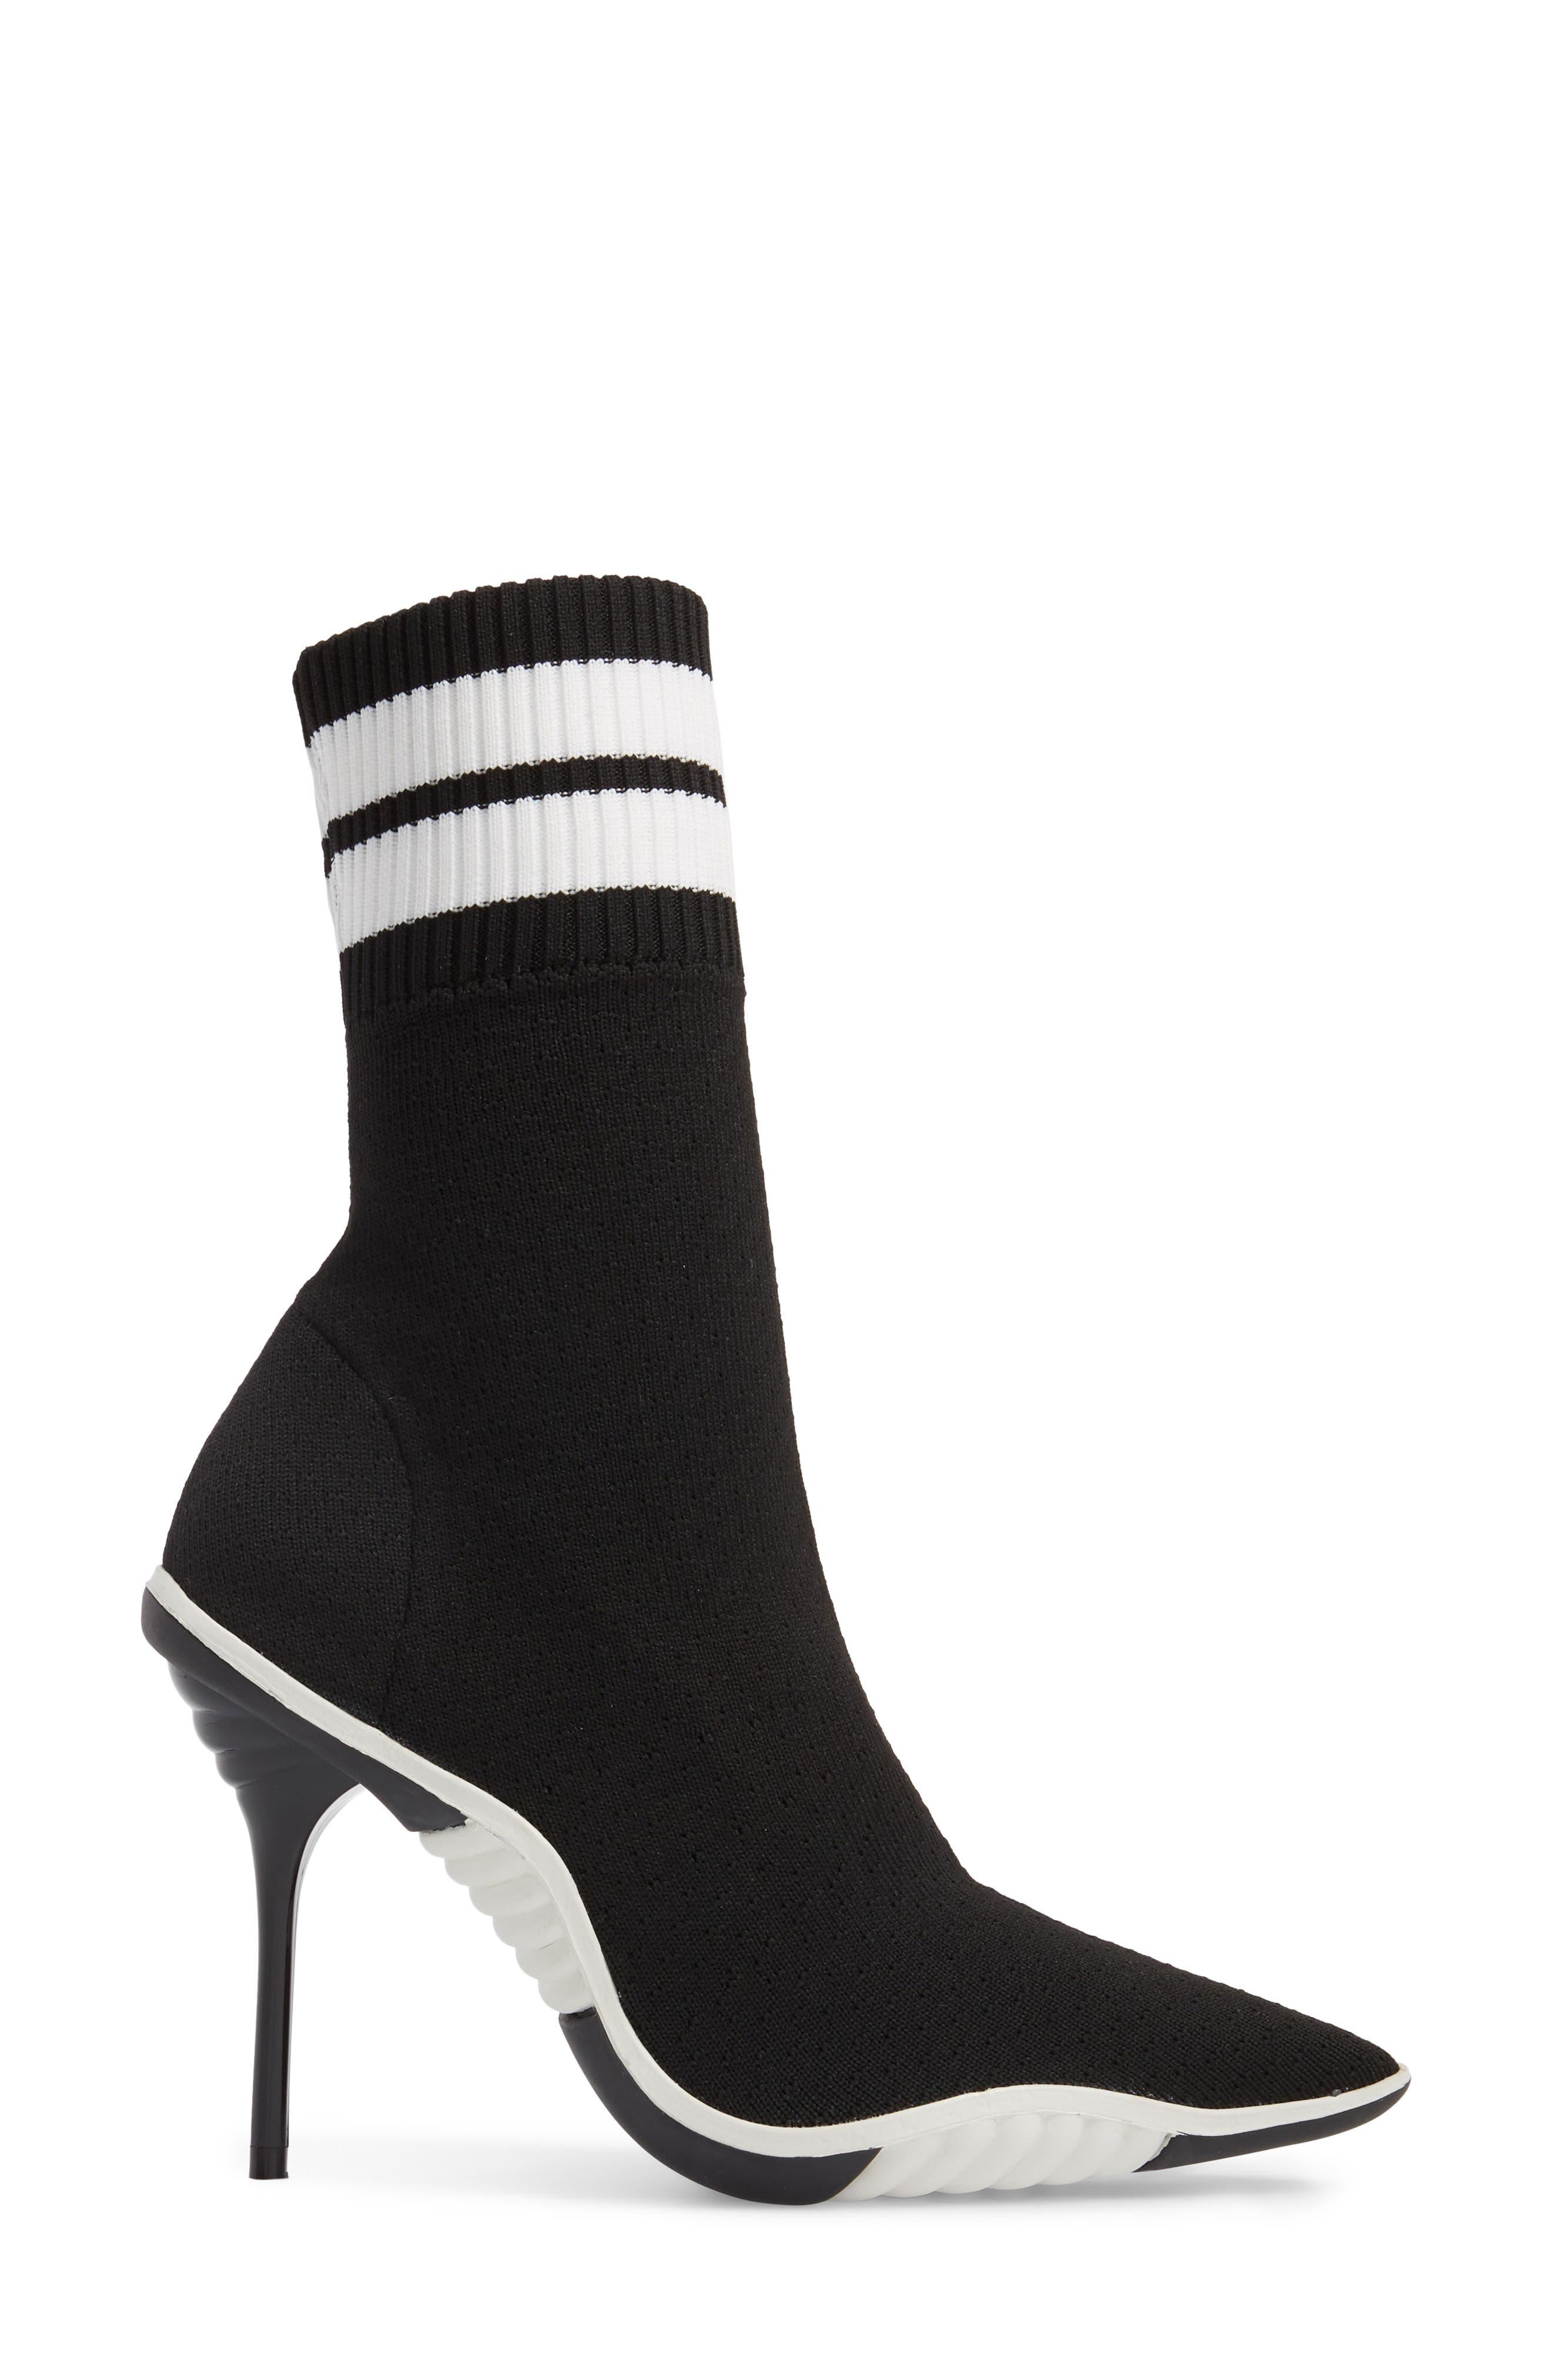 JEFFREY CAMPBELL, Goal Sock Sneaker Bootie, Alternate thumbnail 3, color, BLACK/ WHITE FABRIC